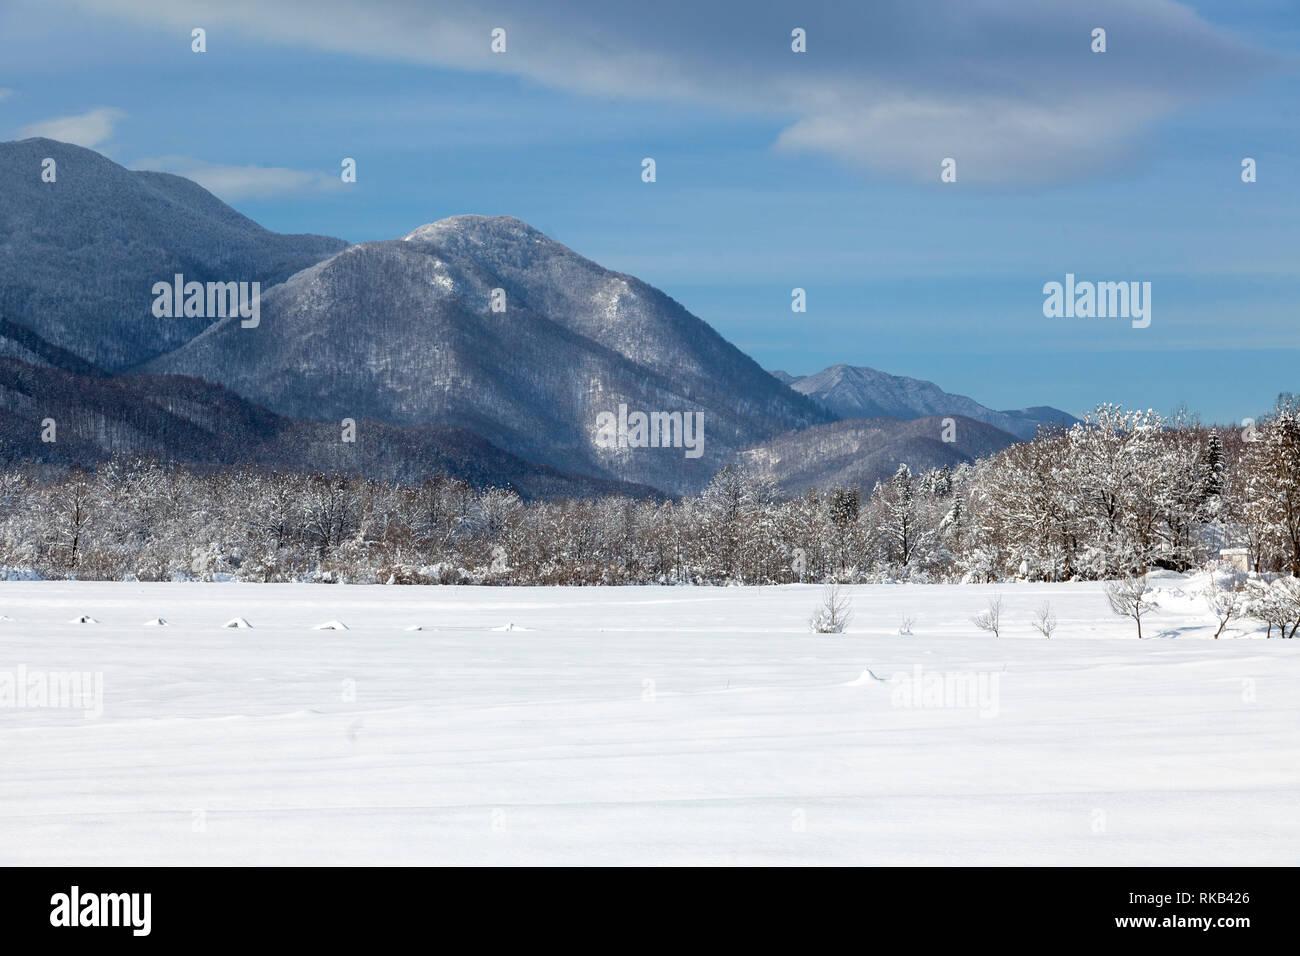 Winter with snow on Lika, foothill of the Velebit Mountain  Croatia - Stock Image